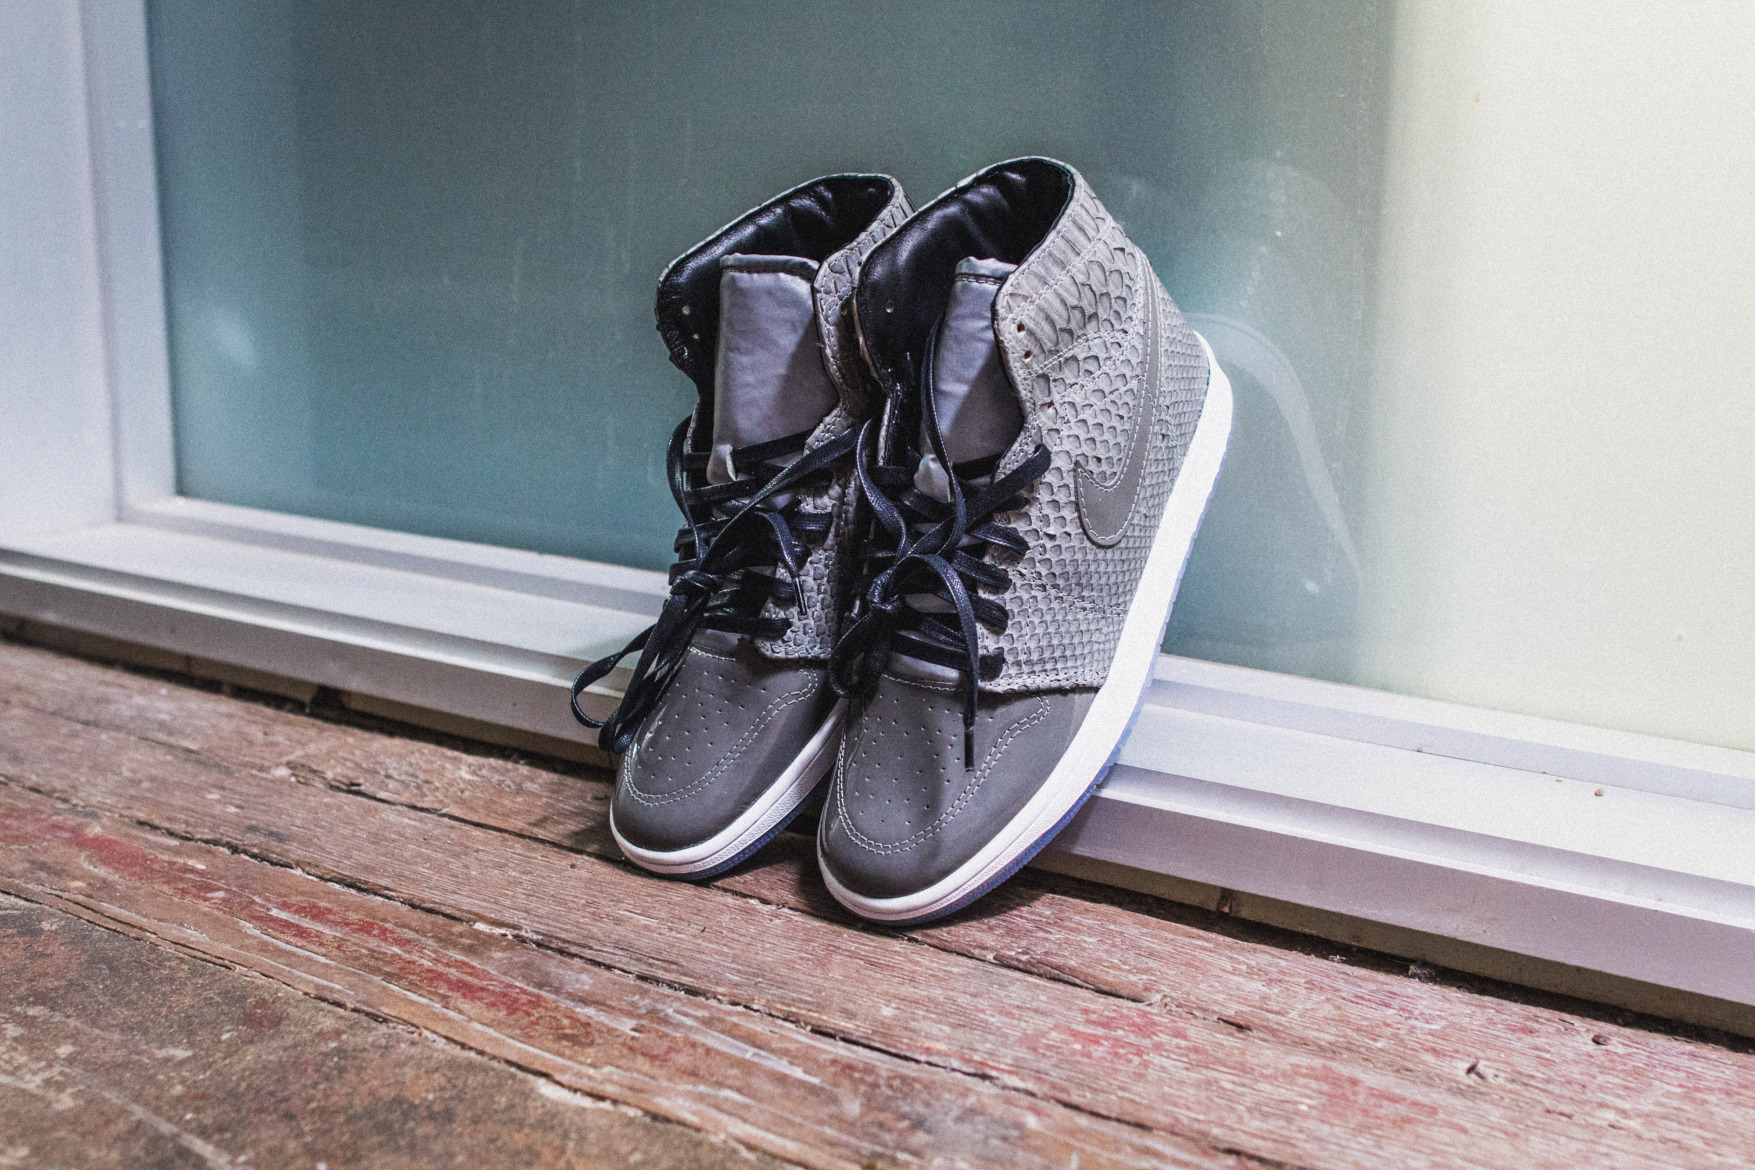 the-shoe-surgeon-custom-air-jordan-1-python-patent-leather-3m-4.jpg